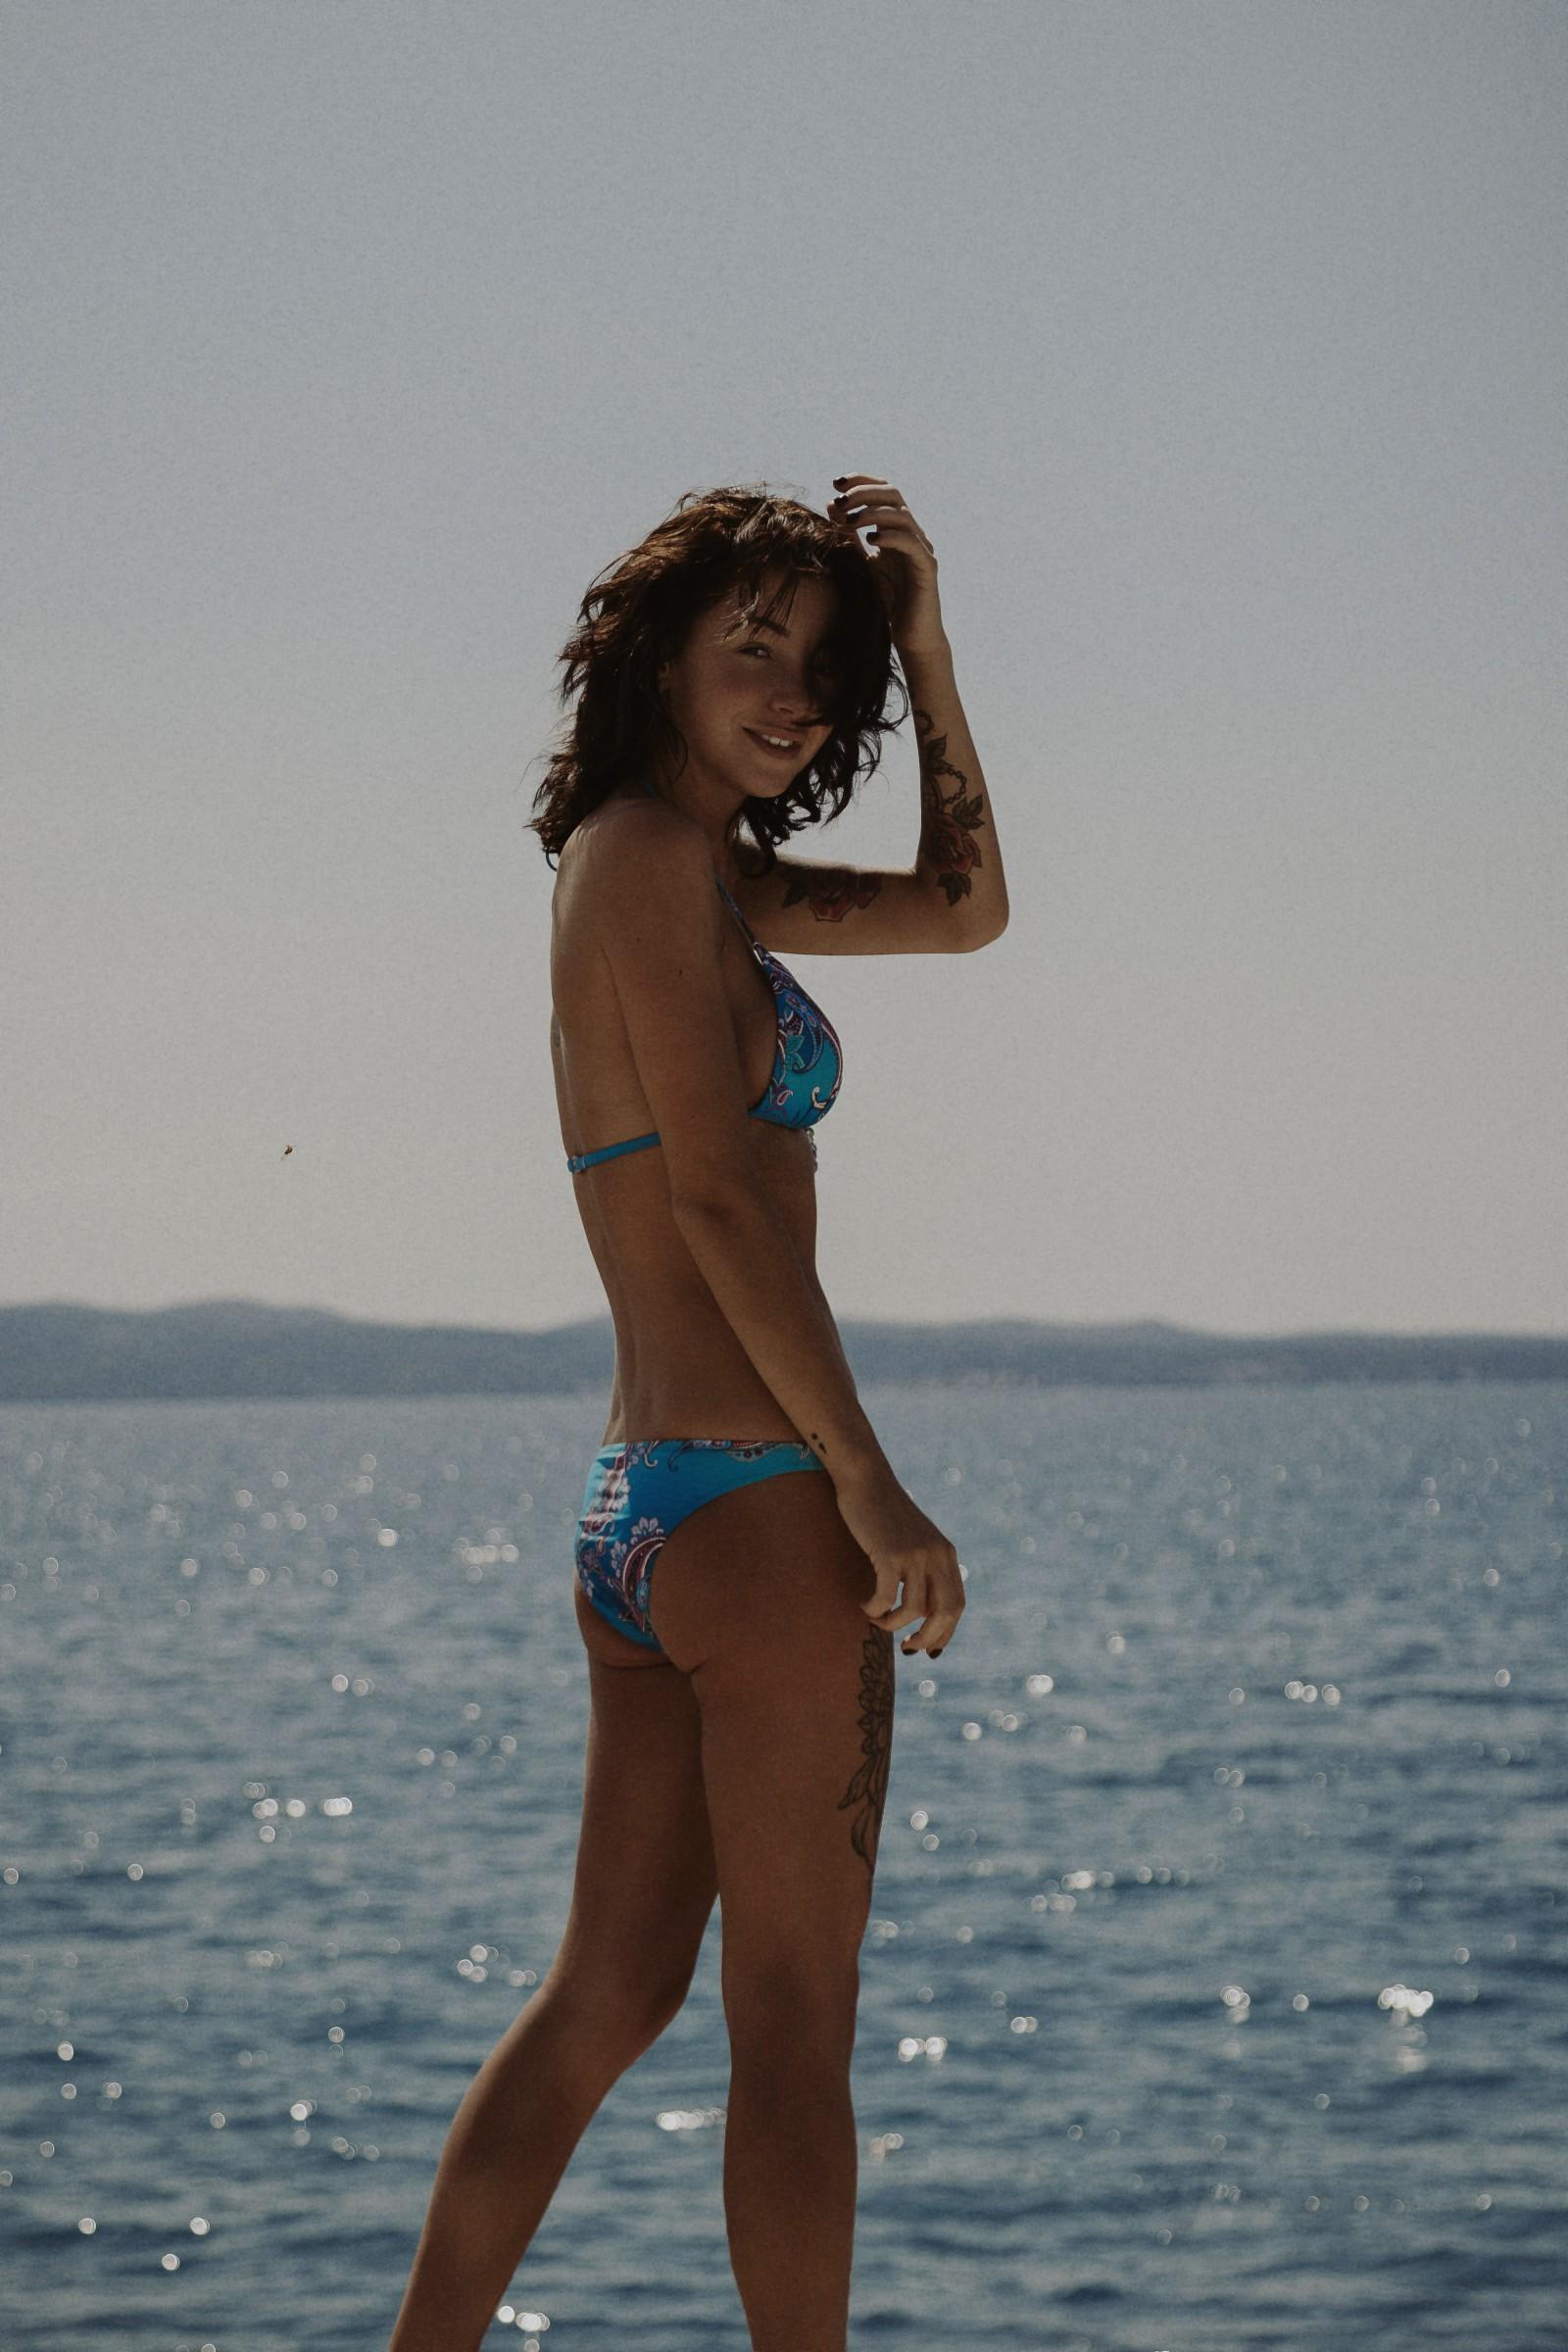 jasmin-kessler-denis-delic-reiseblogger-split-kroatien-erfahrung-2018-0925-5